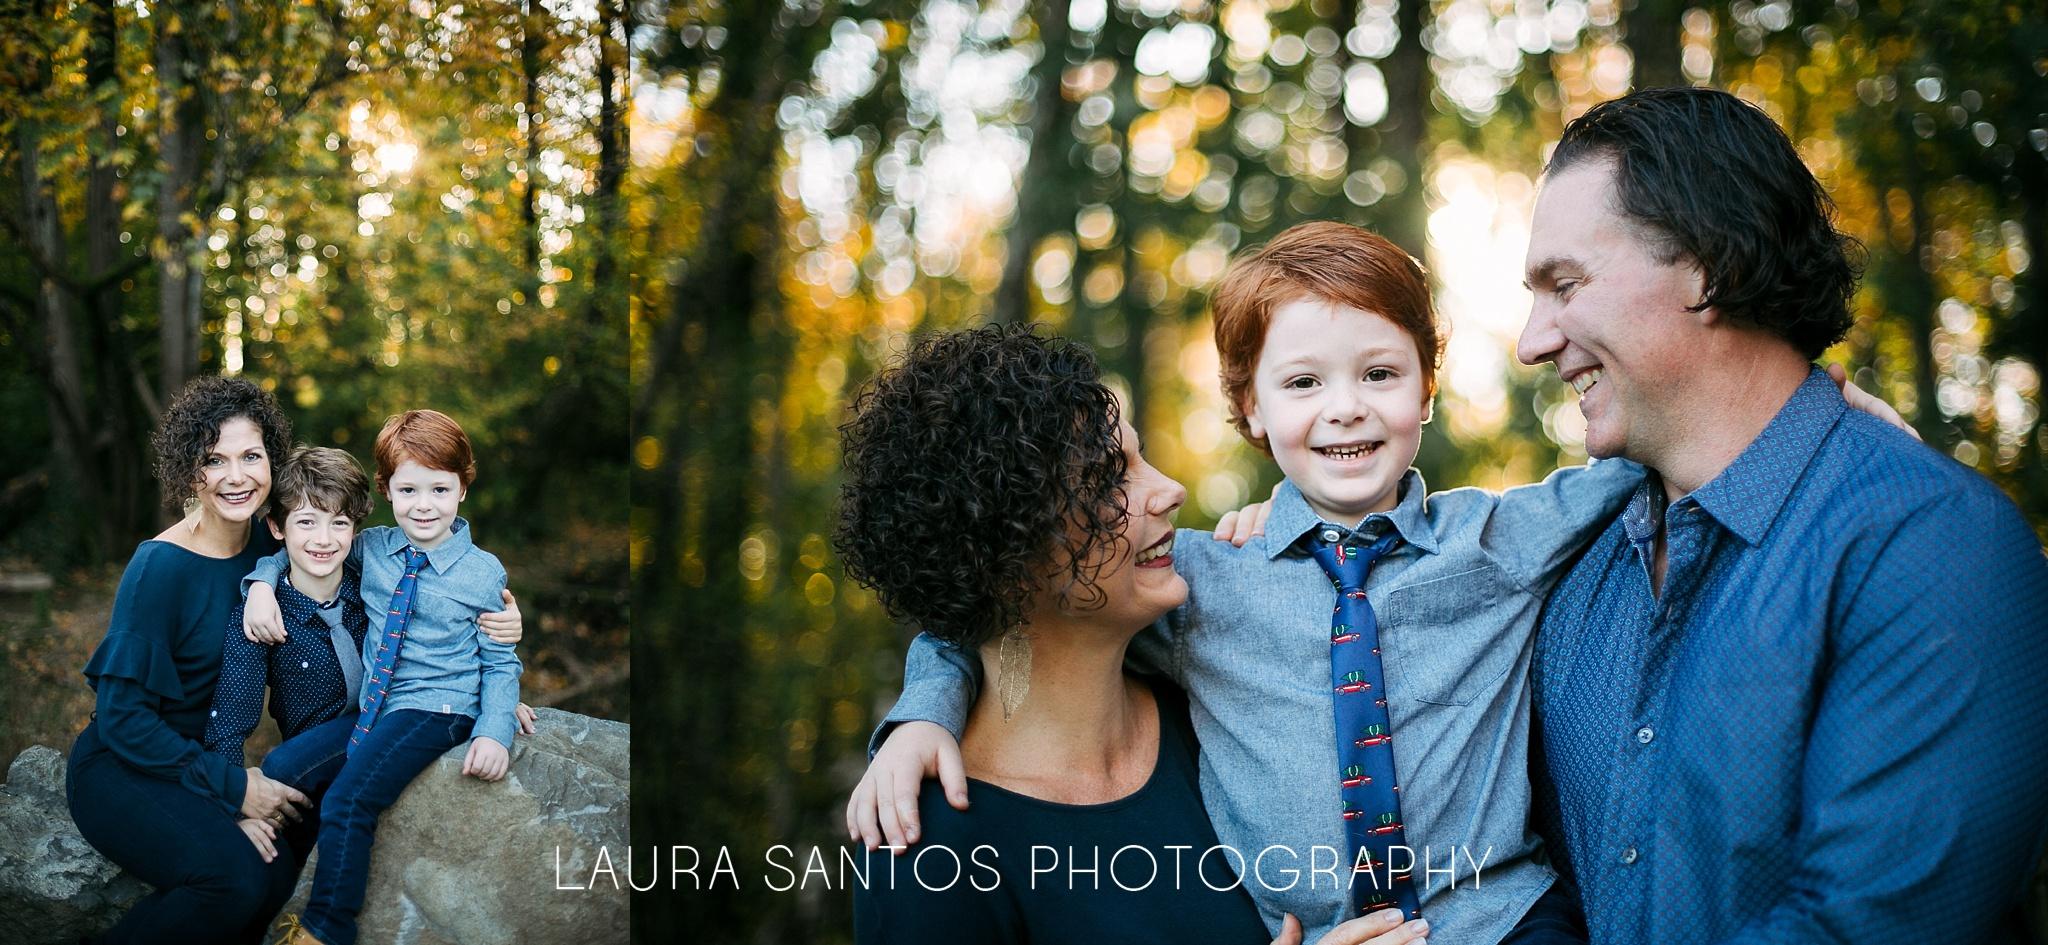 Laura Santos Photography Portland Oregon Family Photographer_0480.jpg